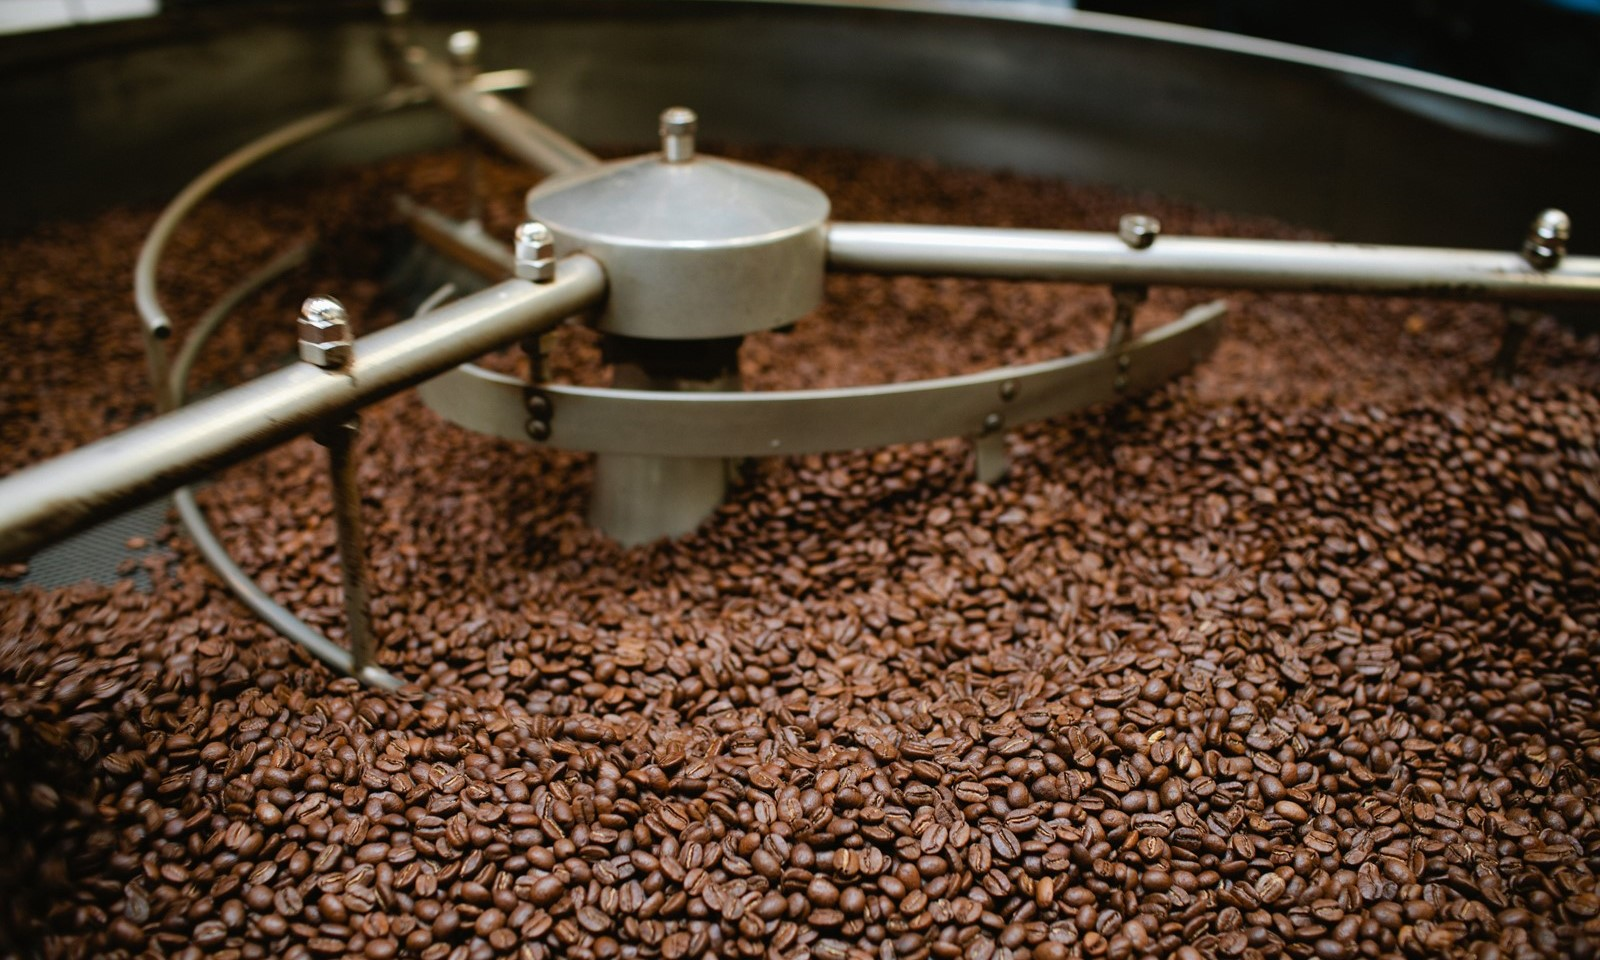 Hoe bewaar je koffie?